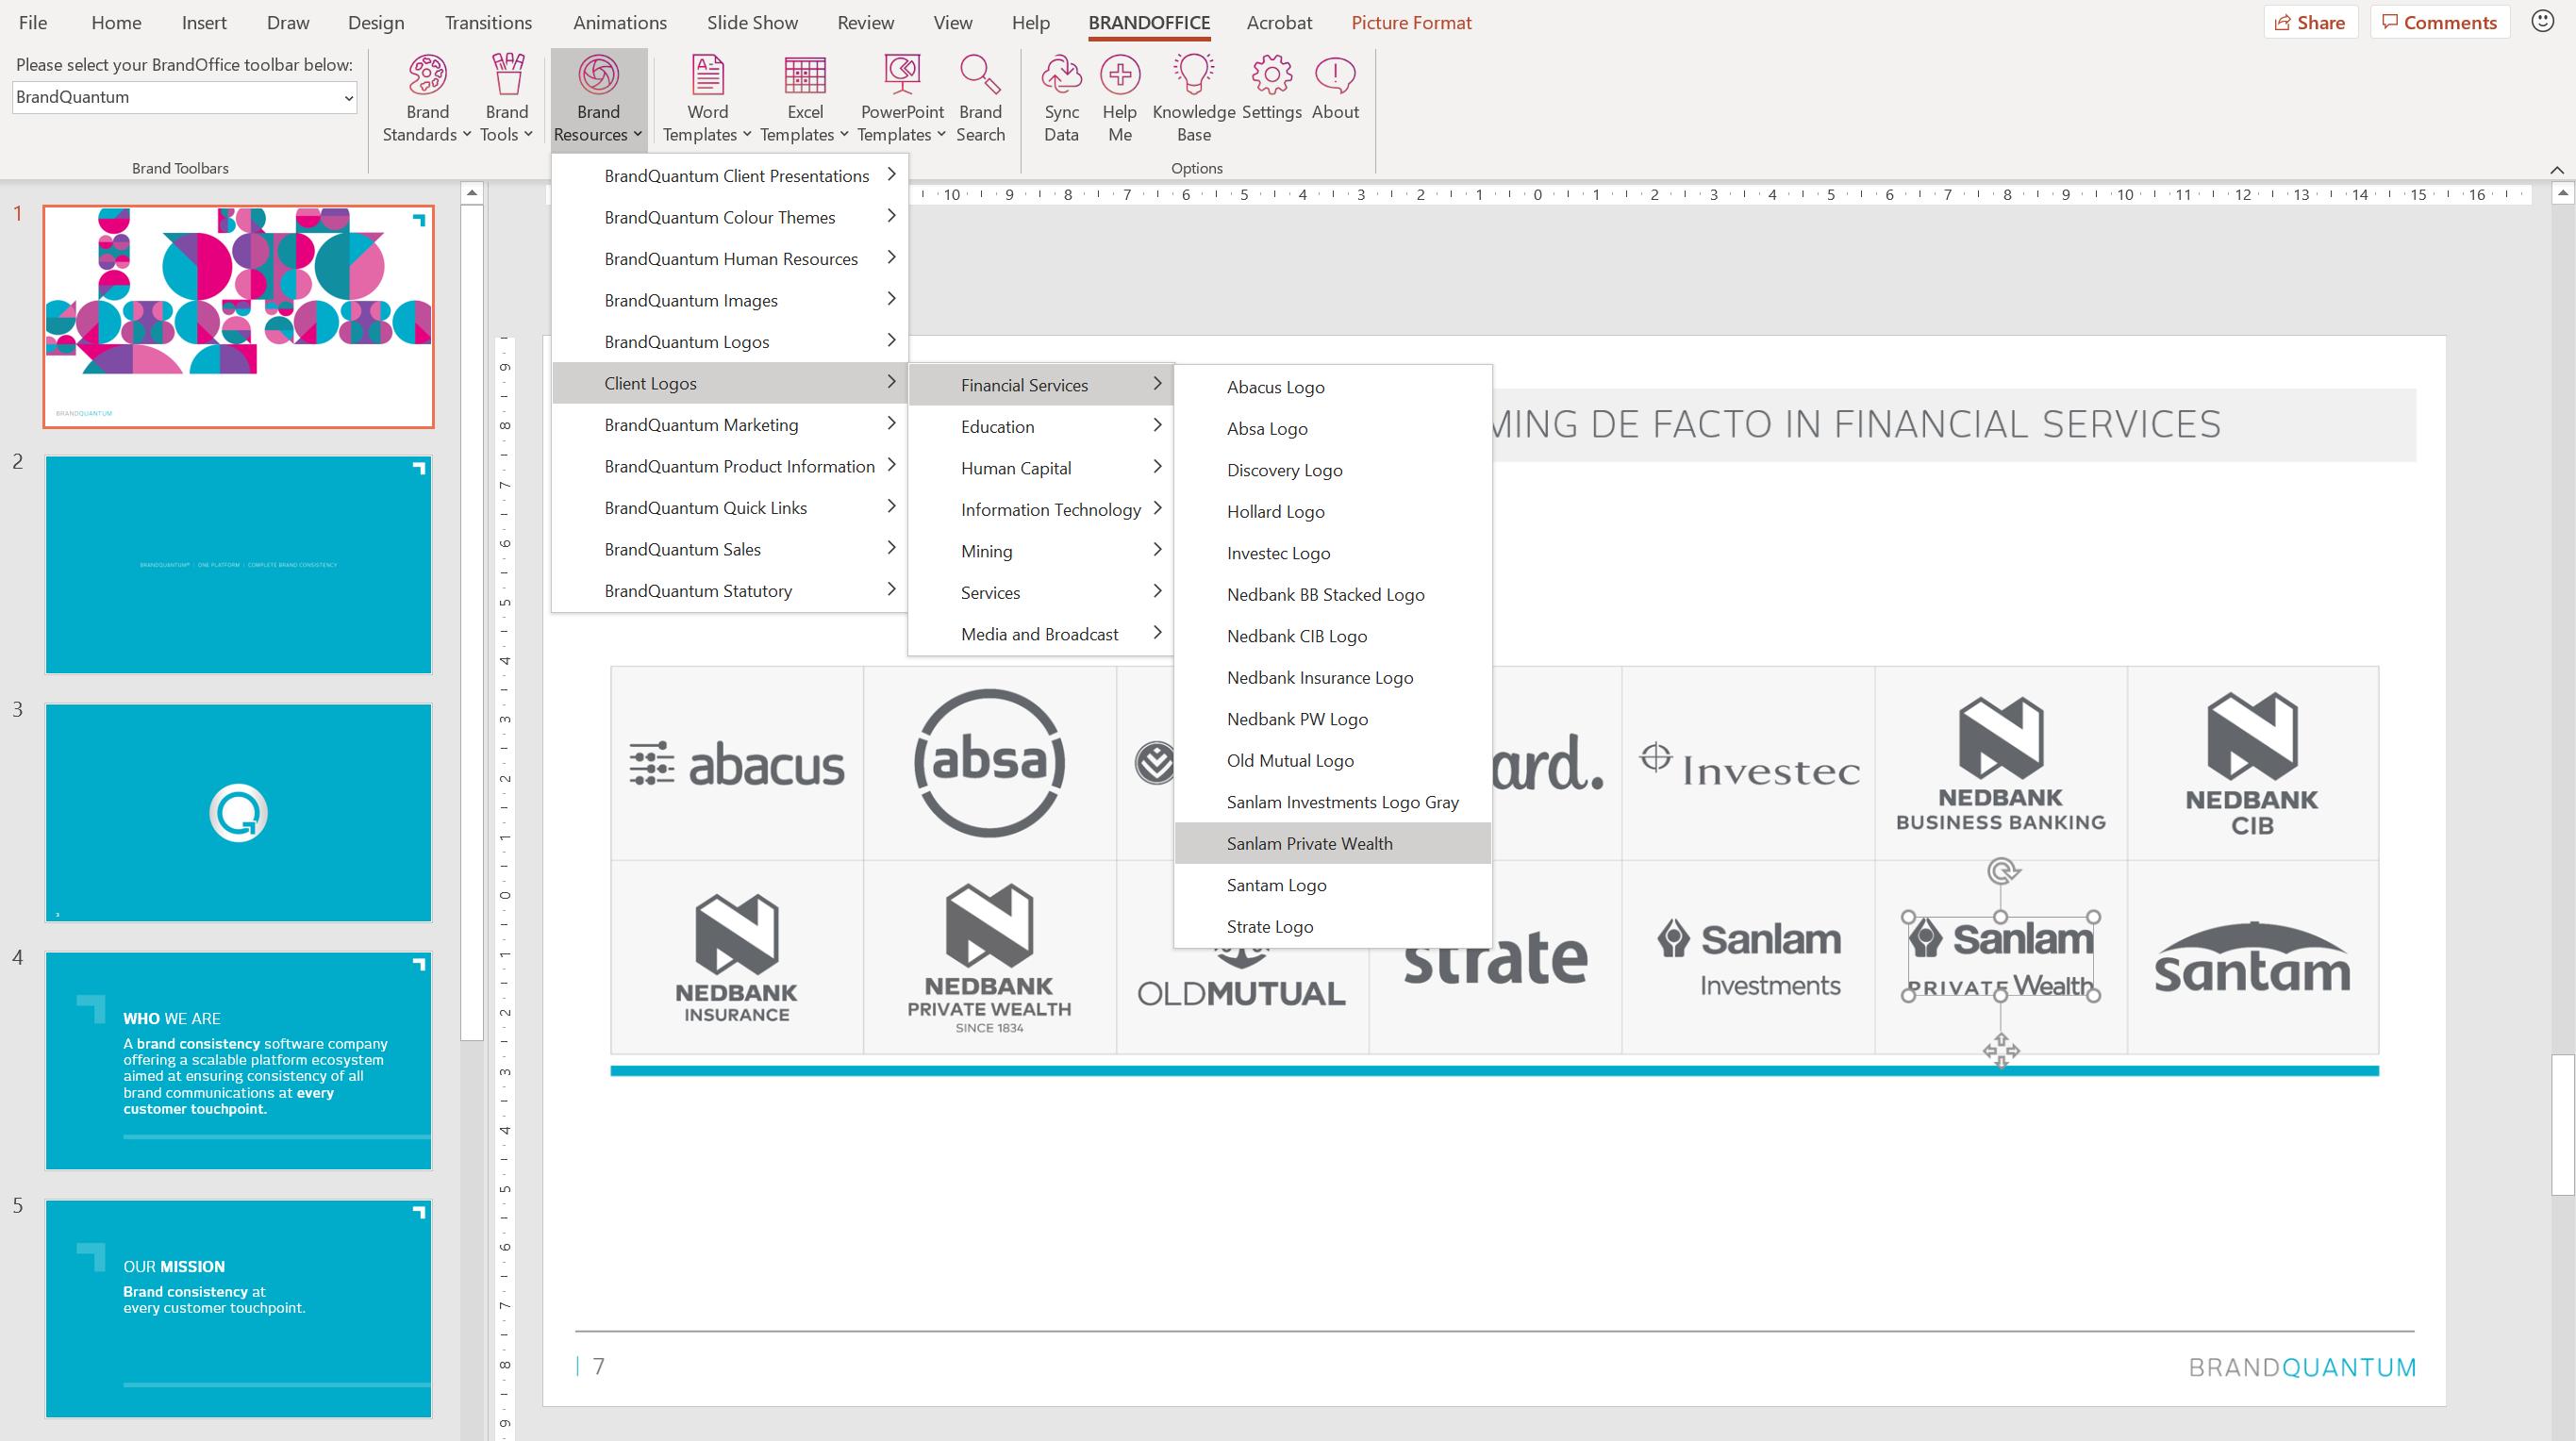 BrandOffice document creation